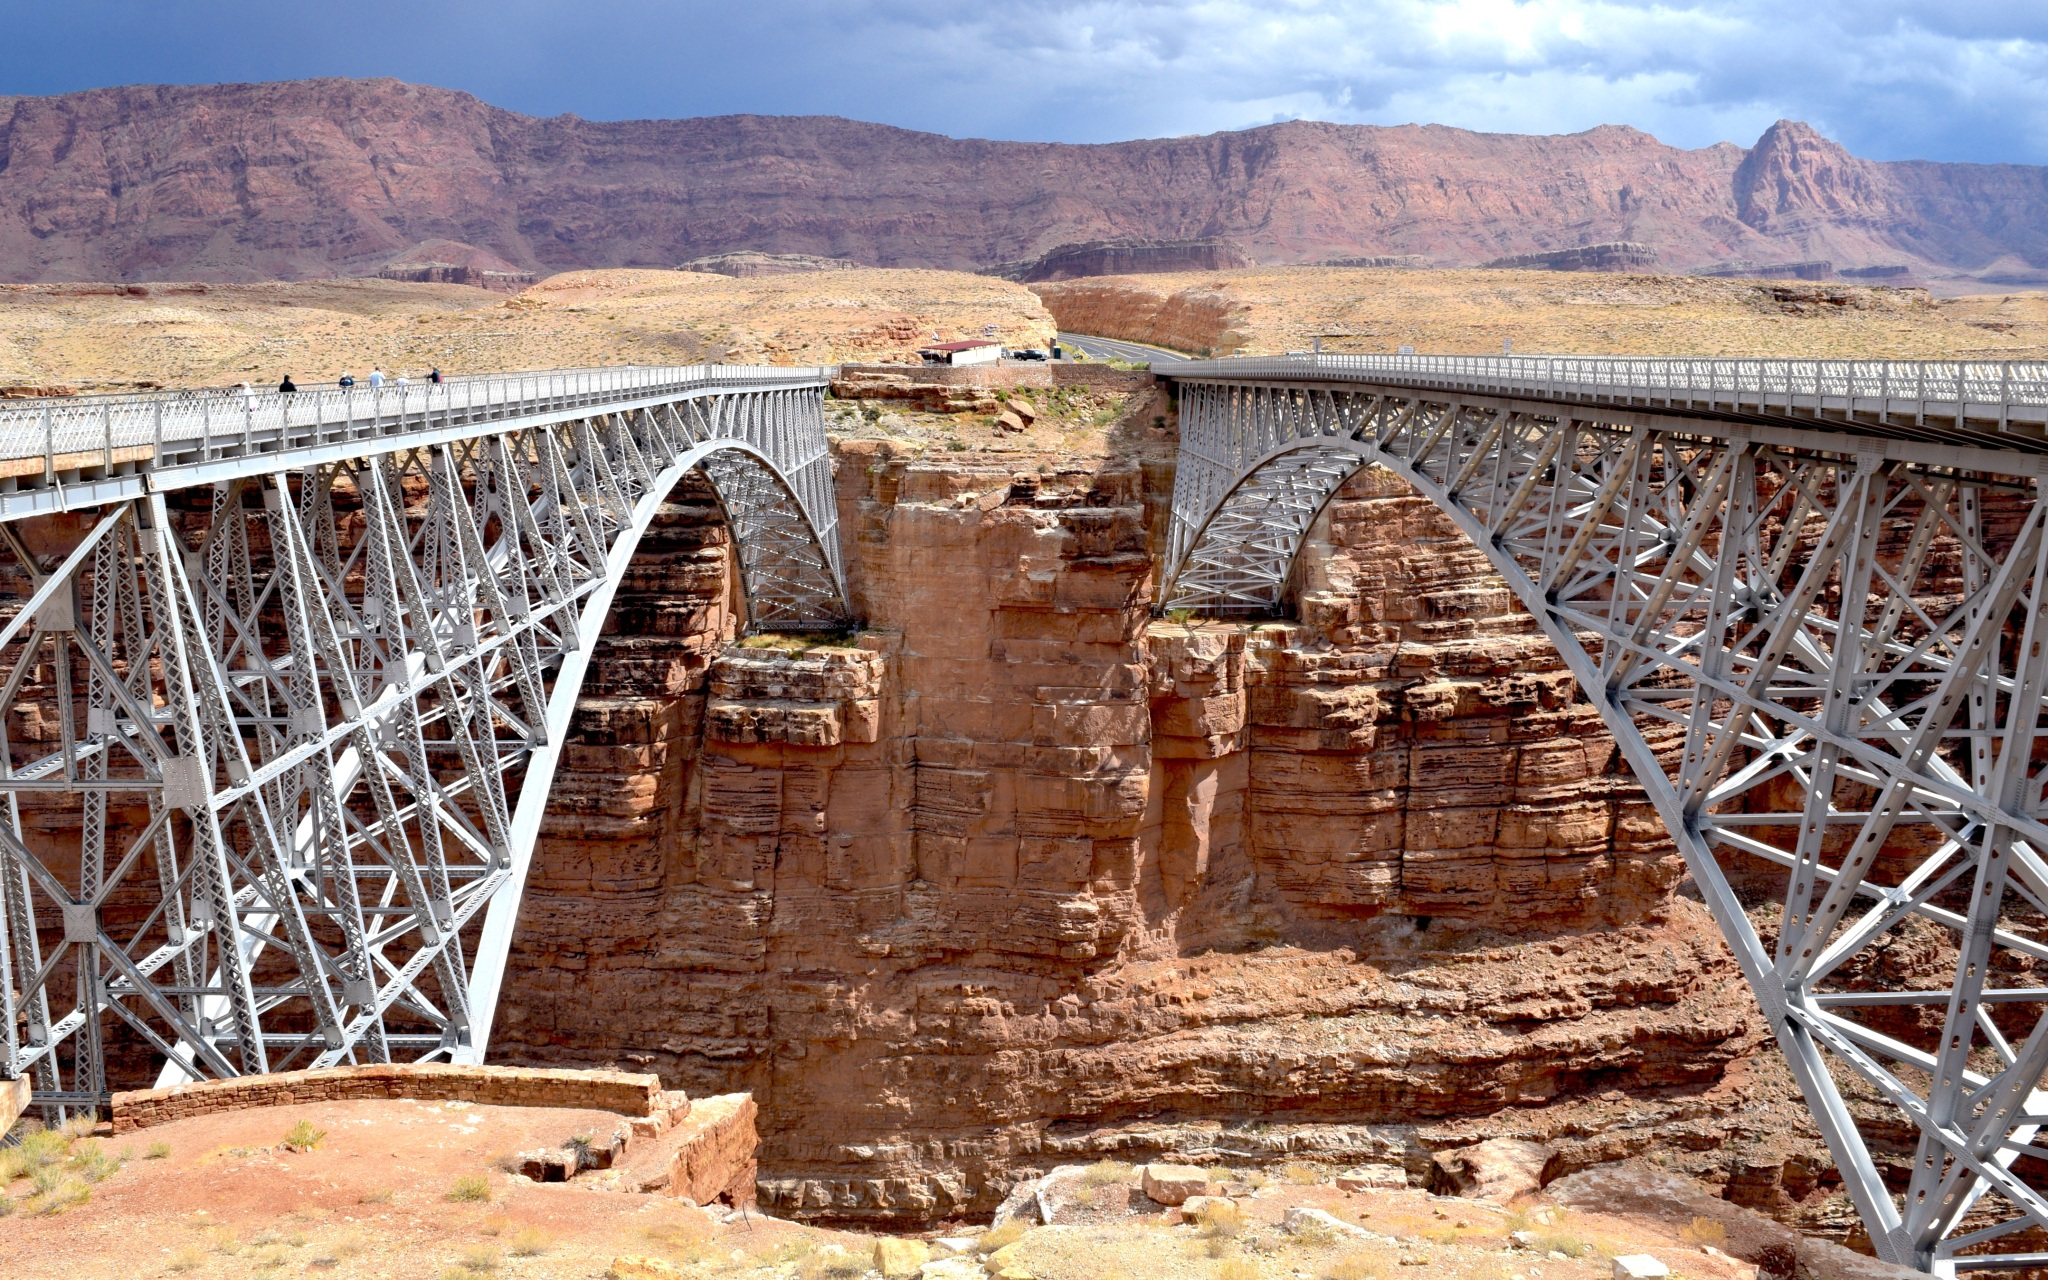 Scenic Route 89A Vermillion Cliffs Navajo Bridge Road Trip US Togetherintransit.nl